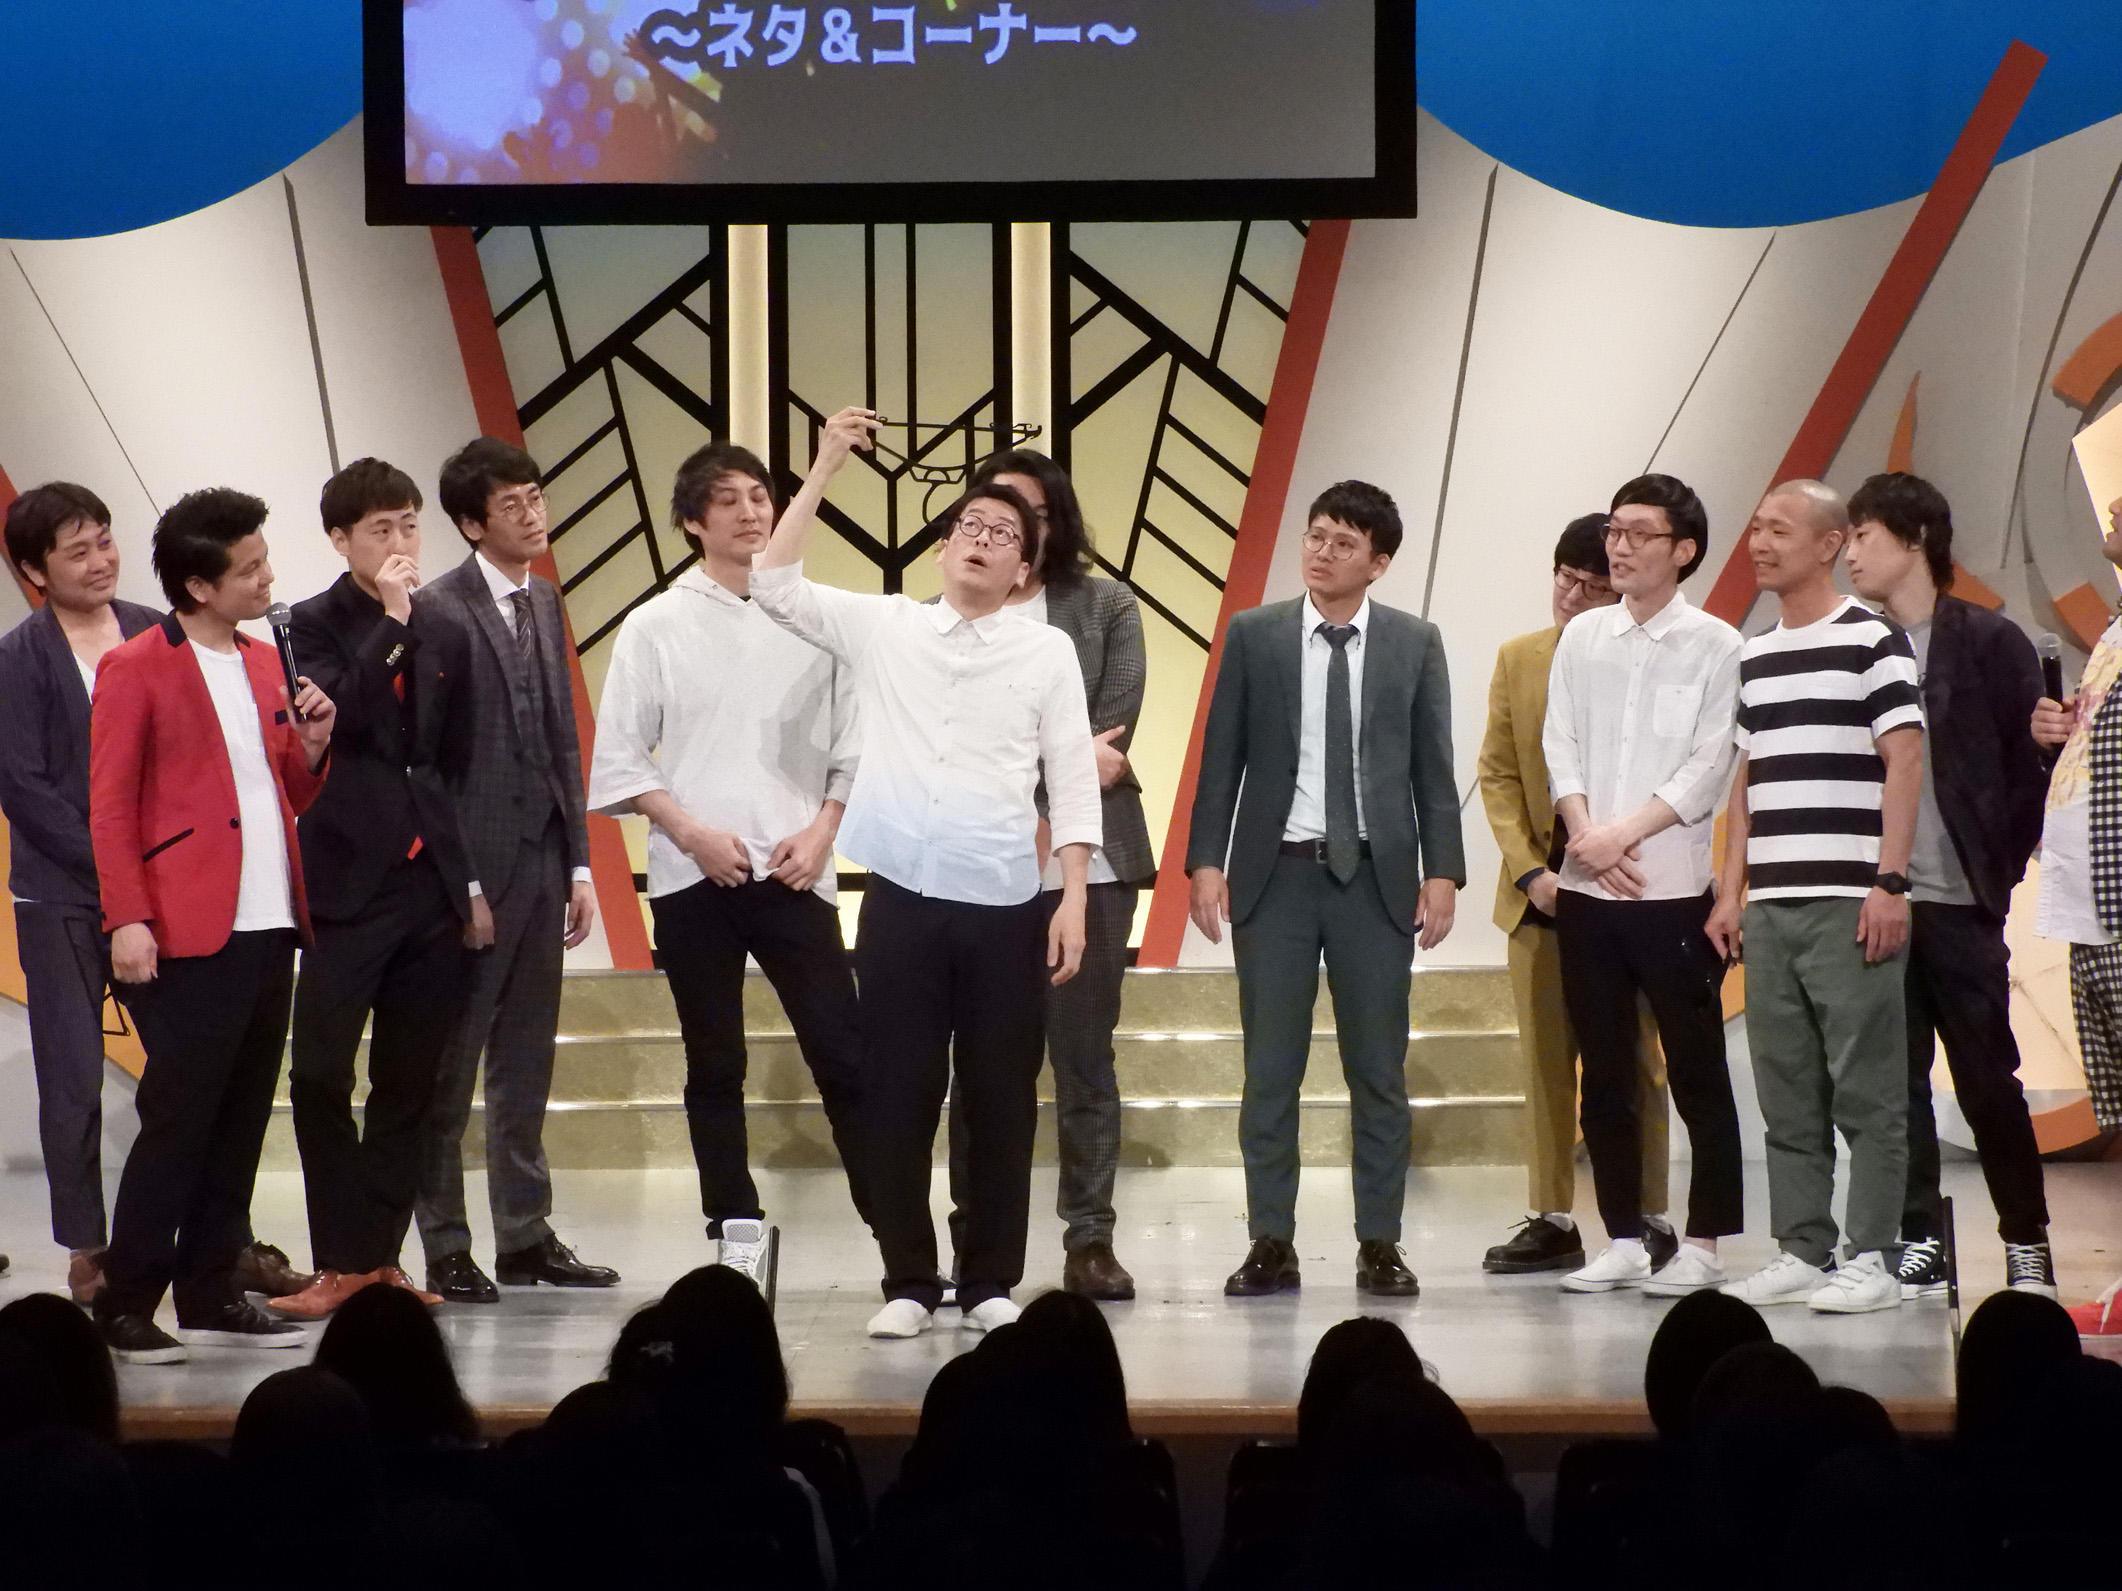 http://news.yoshimoto.co.jp/20180528121219-b0aed6eb49430c2577741daa7ea23694bb8812dc.jpg